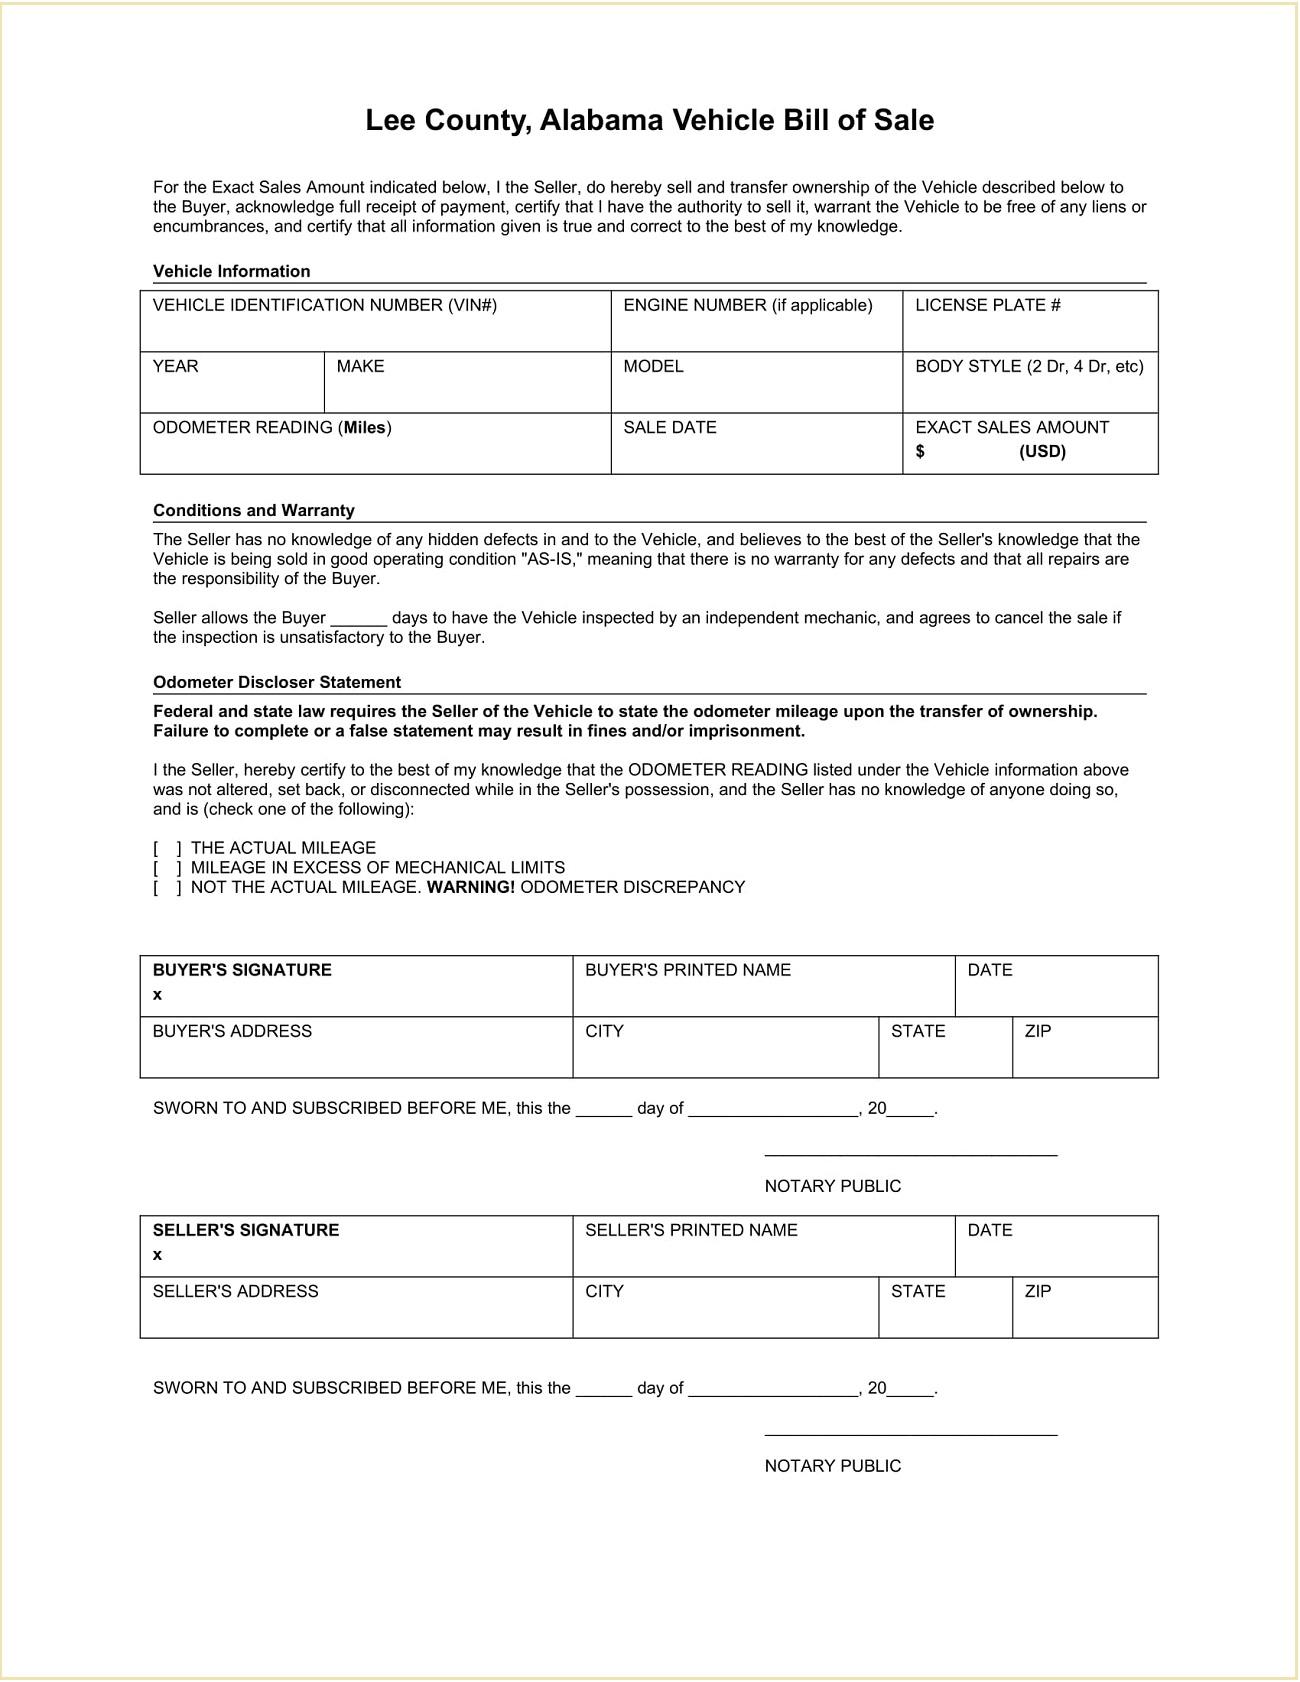 Lee County DMV Alabama Motor Vehicle Bill of Sale Form Template Word